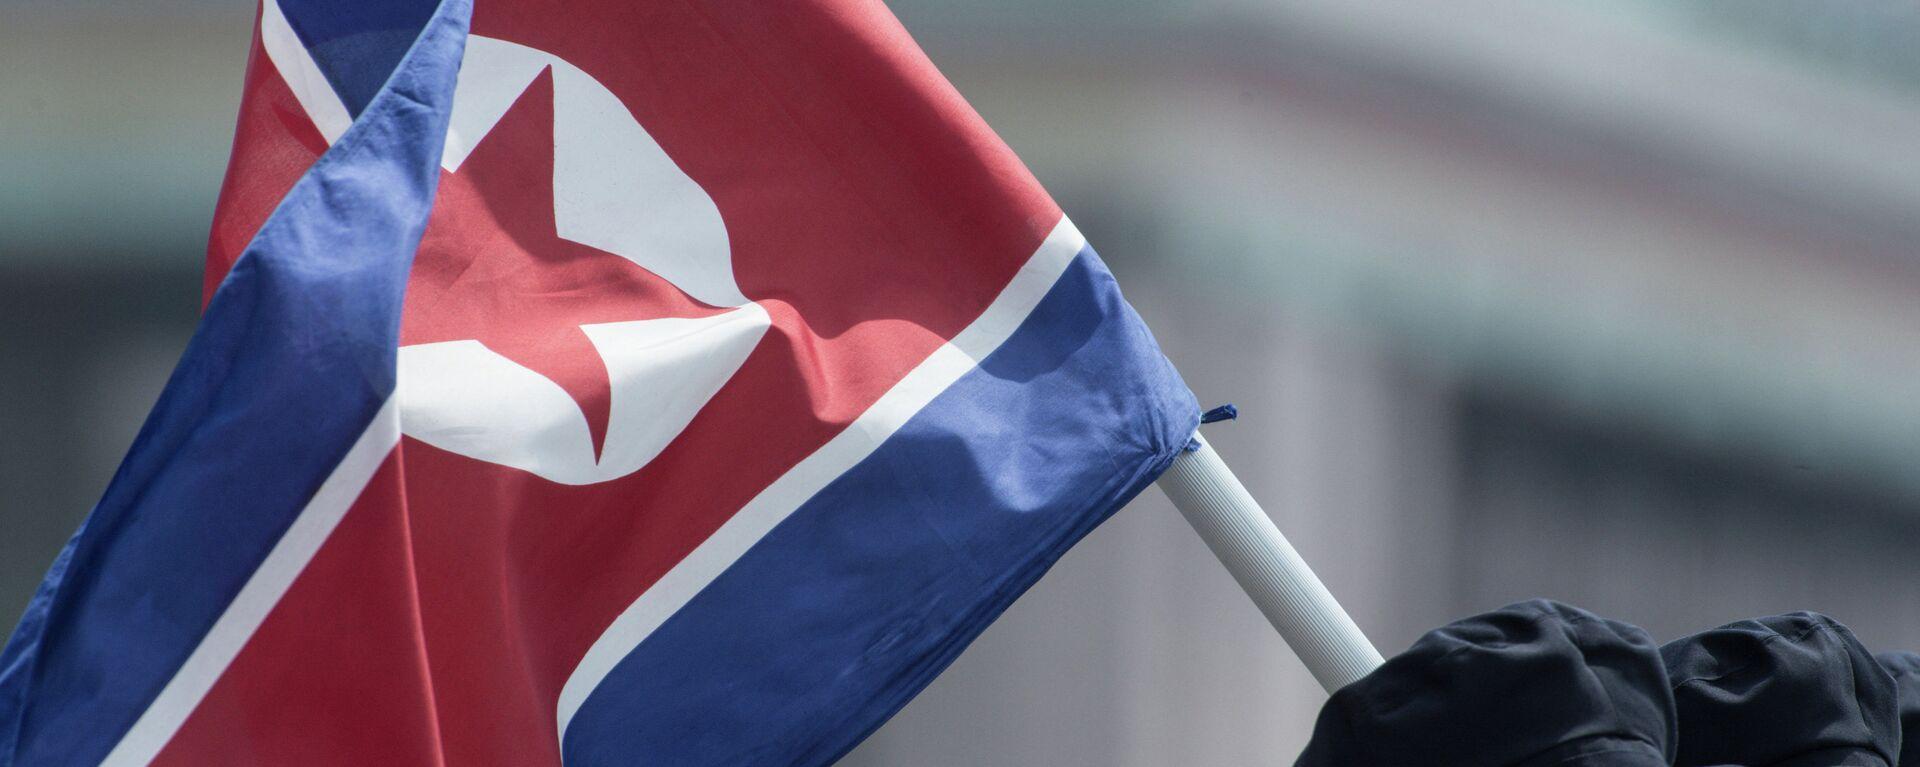 Bandera de Corea del Norte - Sputnik Mundo, 1920, 03.05.2021